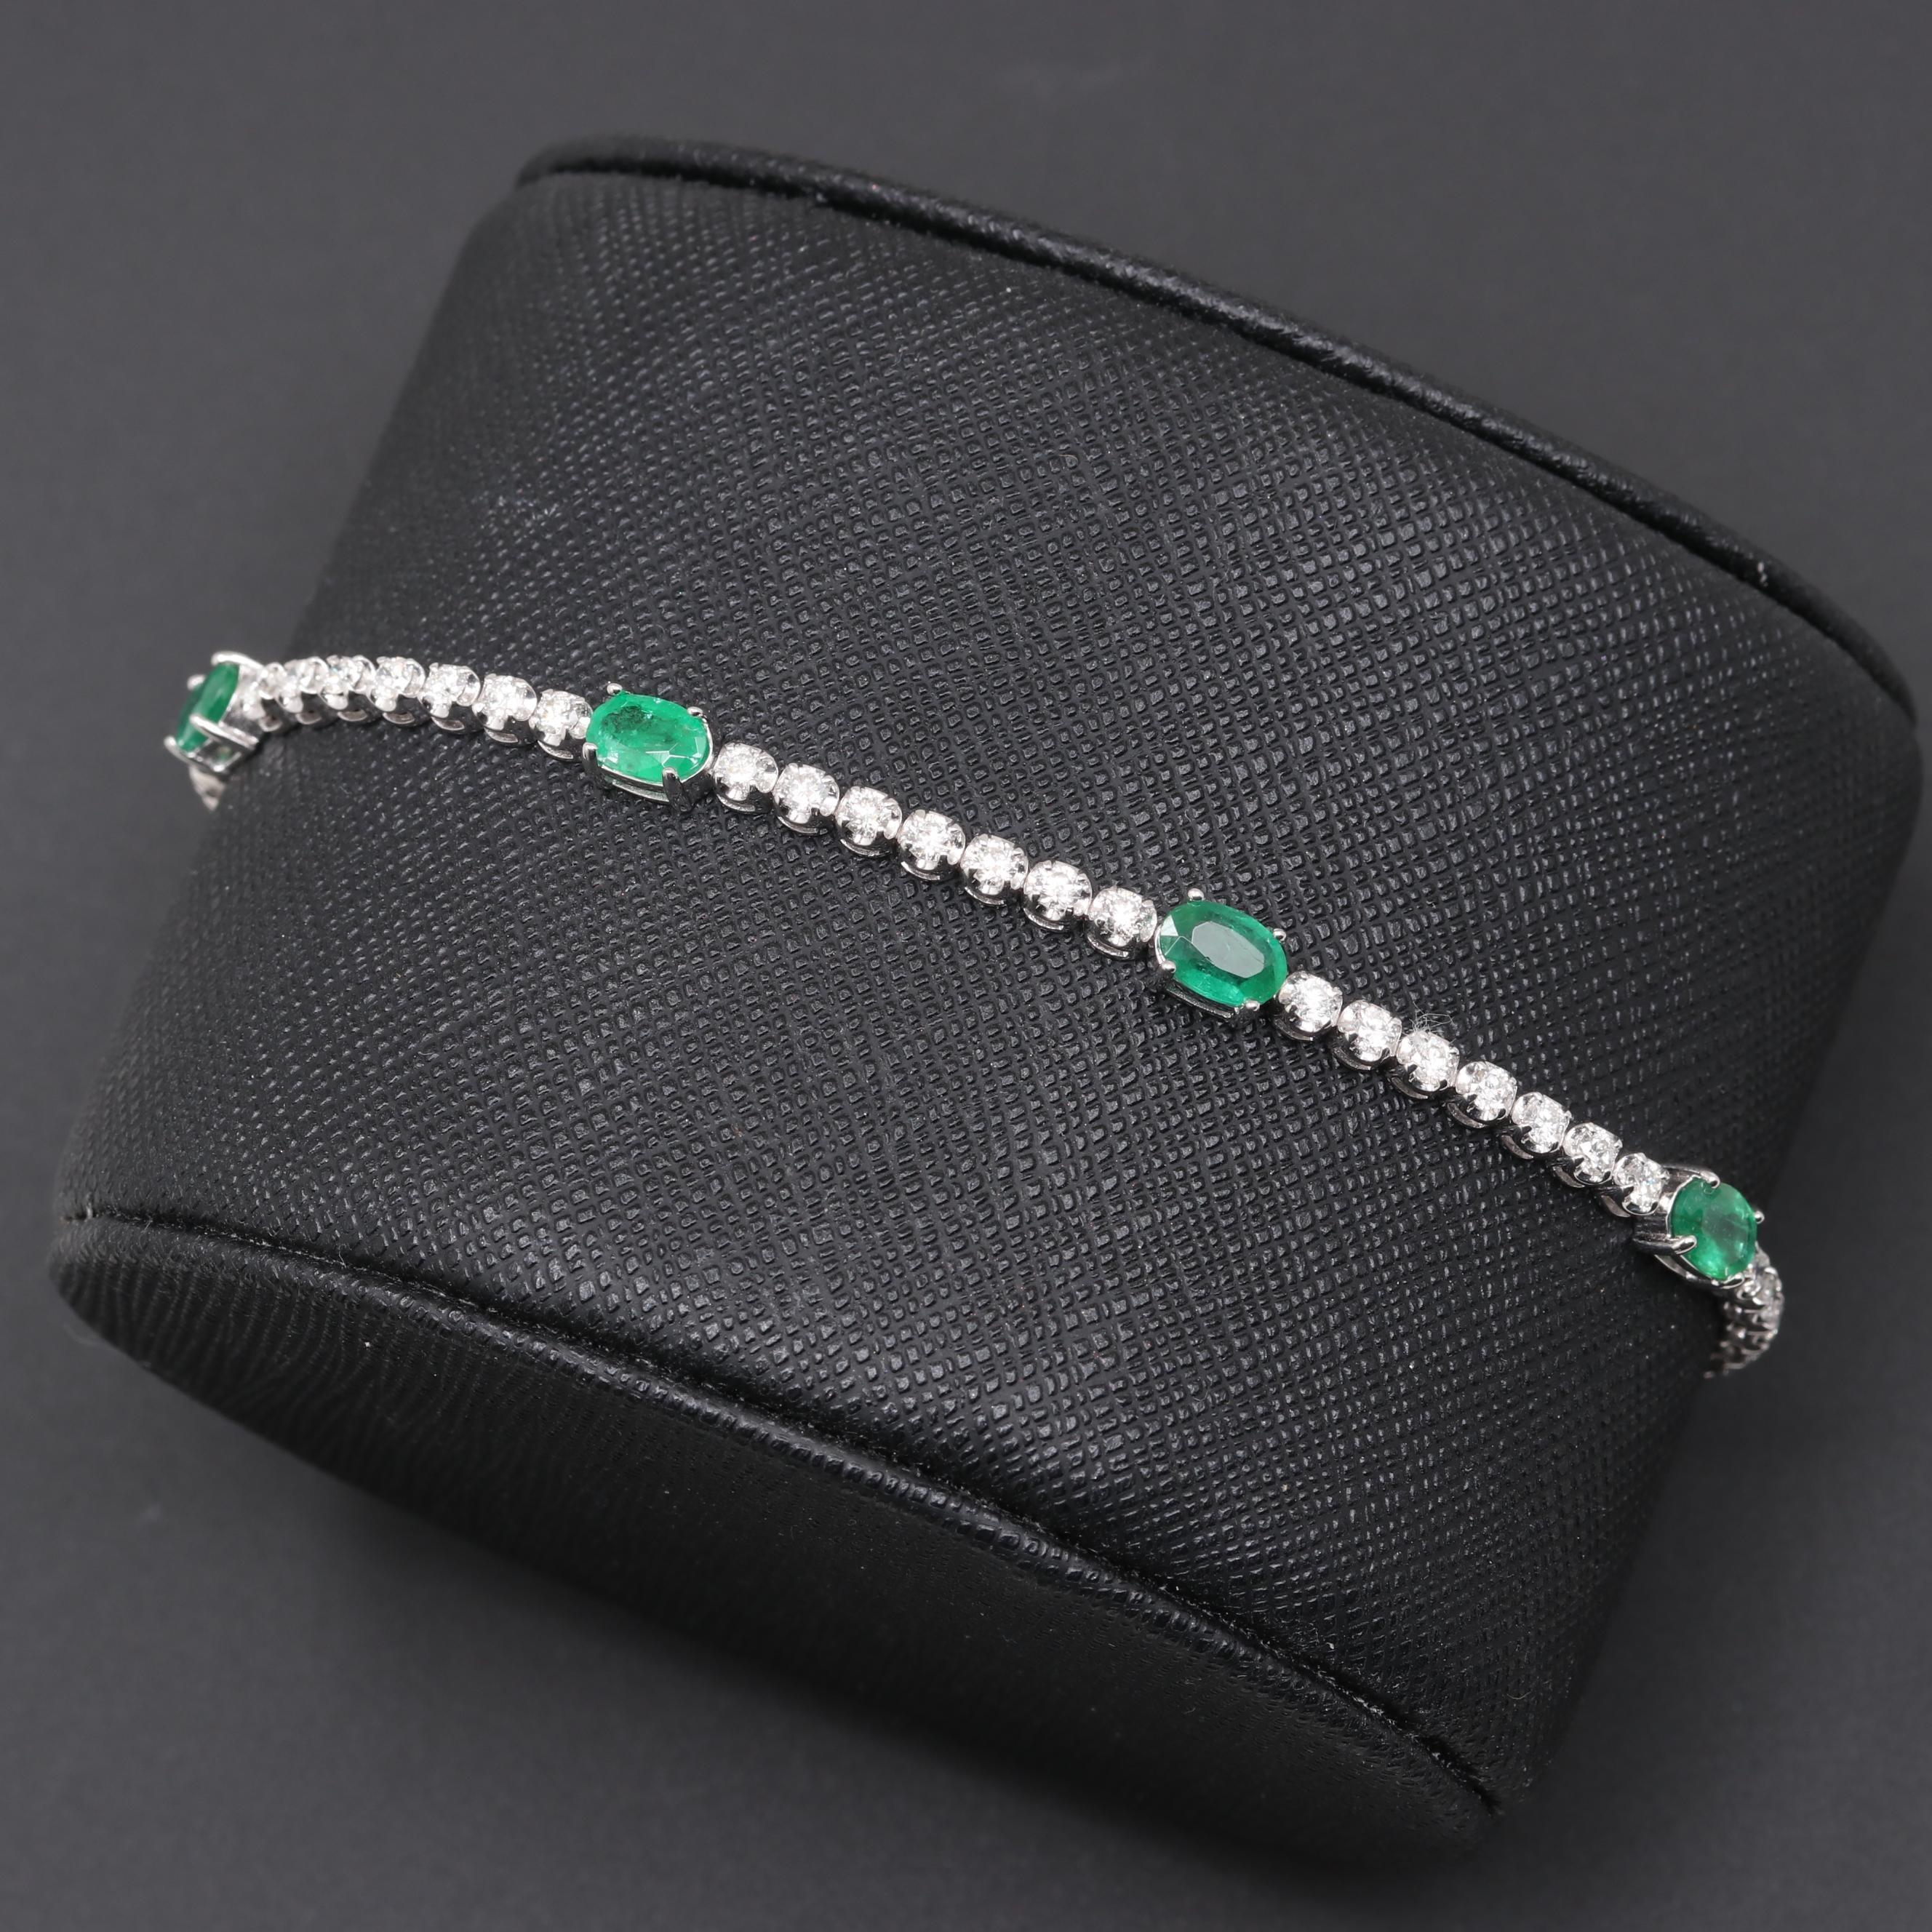 18K White Gold Emerald and 1.65 CTW Diamond Bracelet